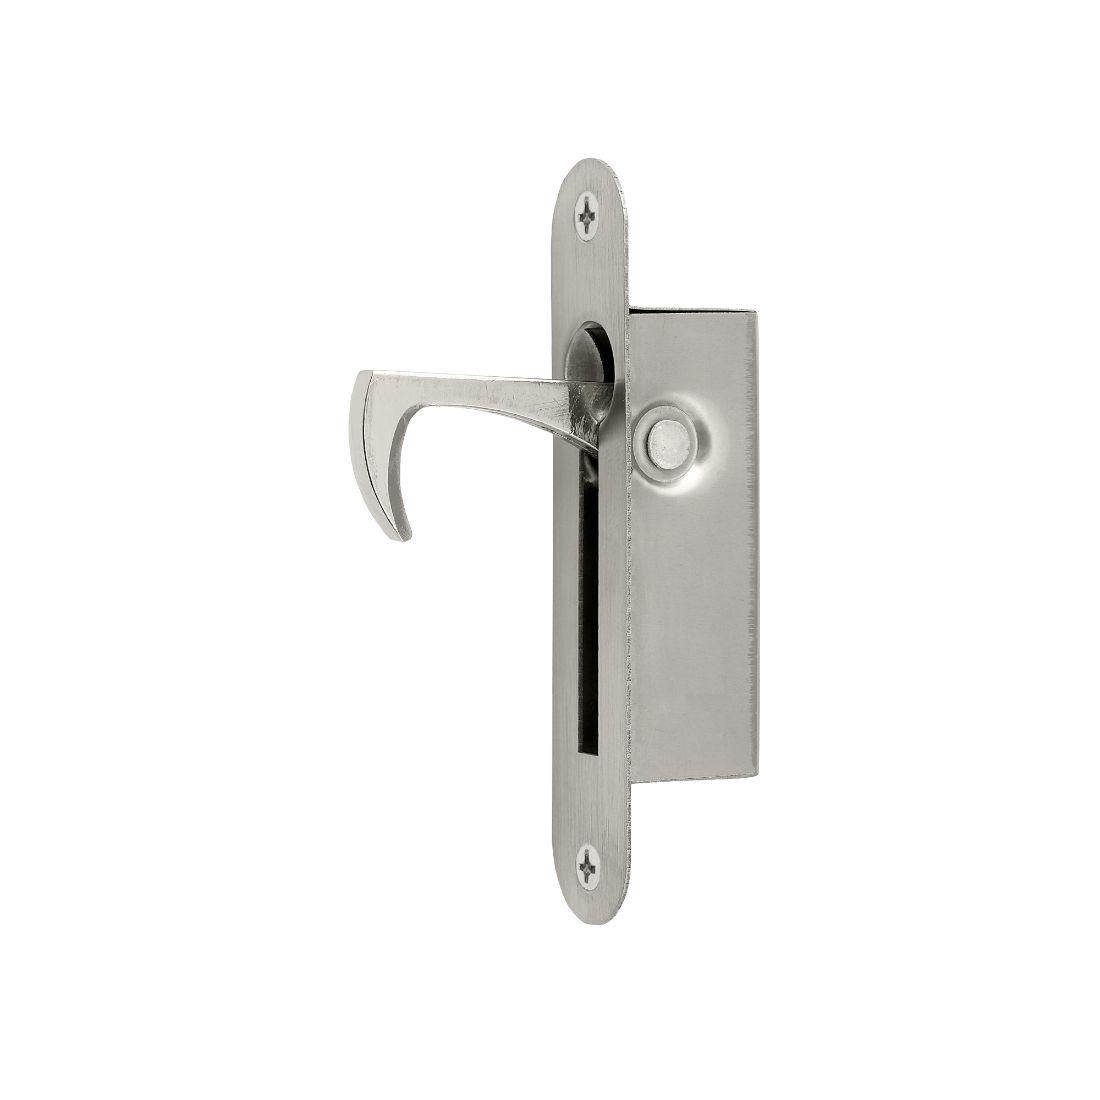 Oval Door Edge Pull 100 x 20mm Stainless Steel